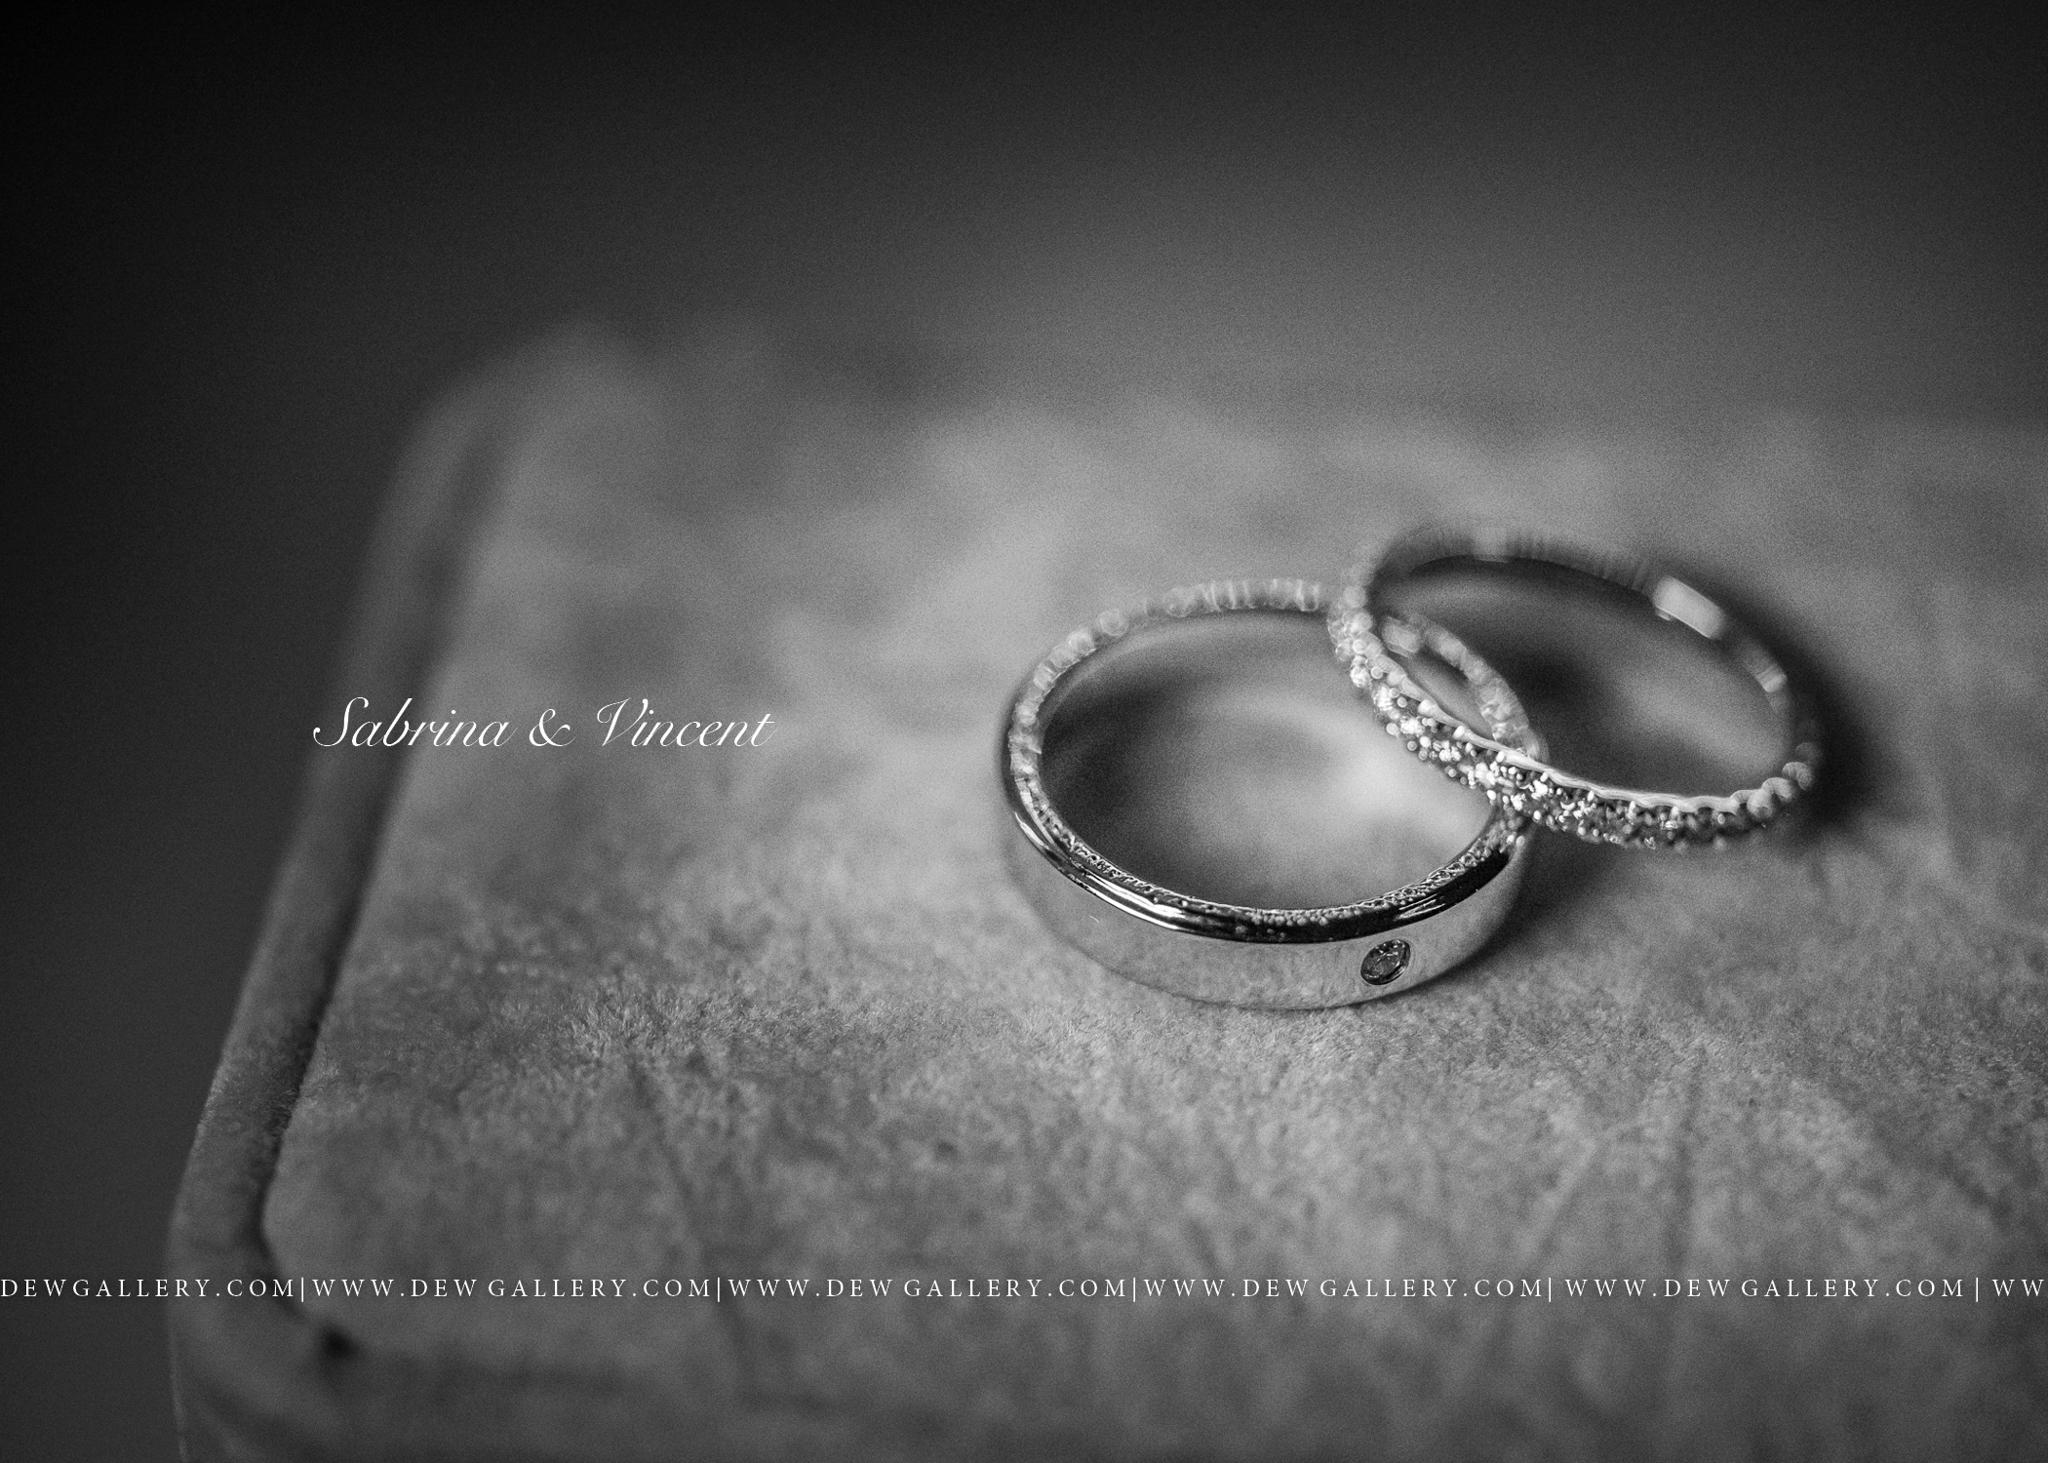 Sabrina & Vincent Wedding Day Album36